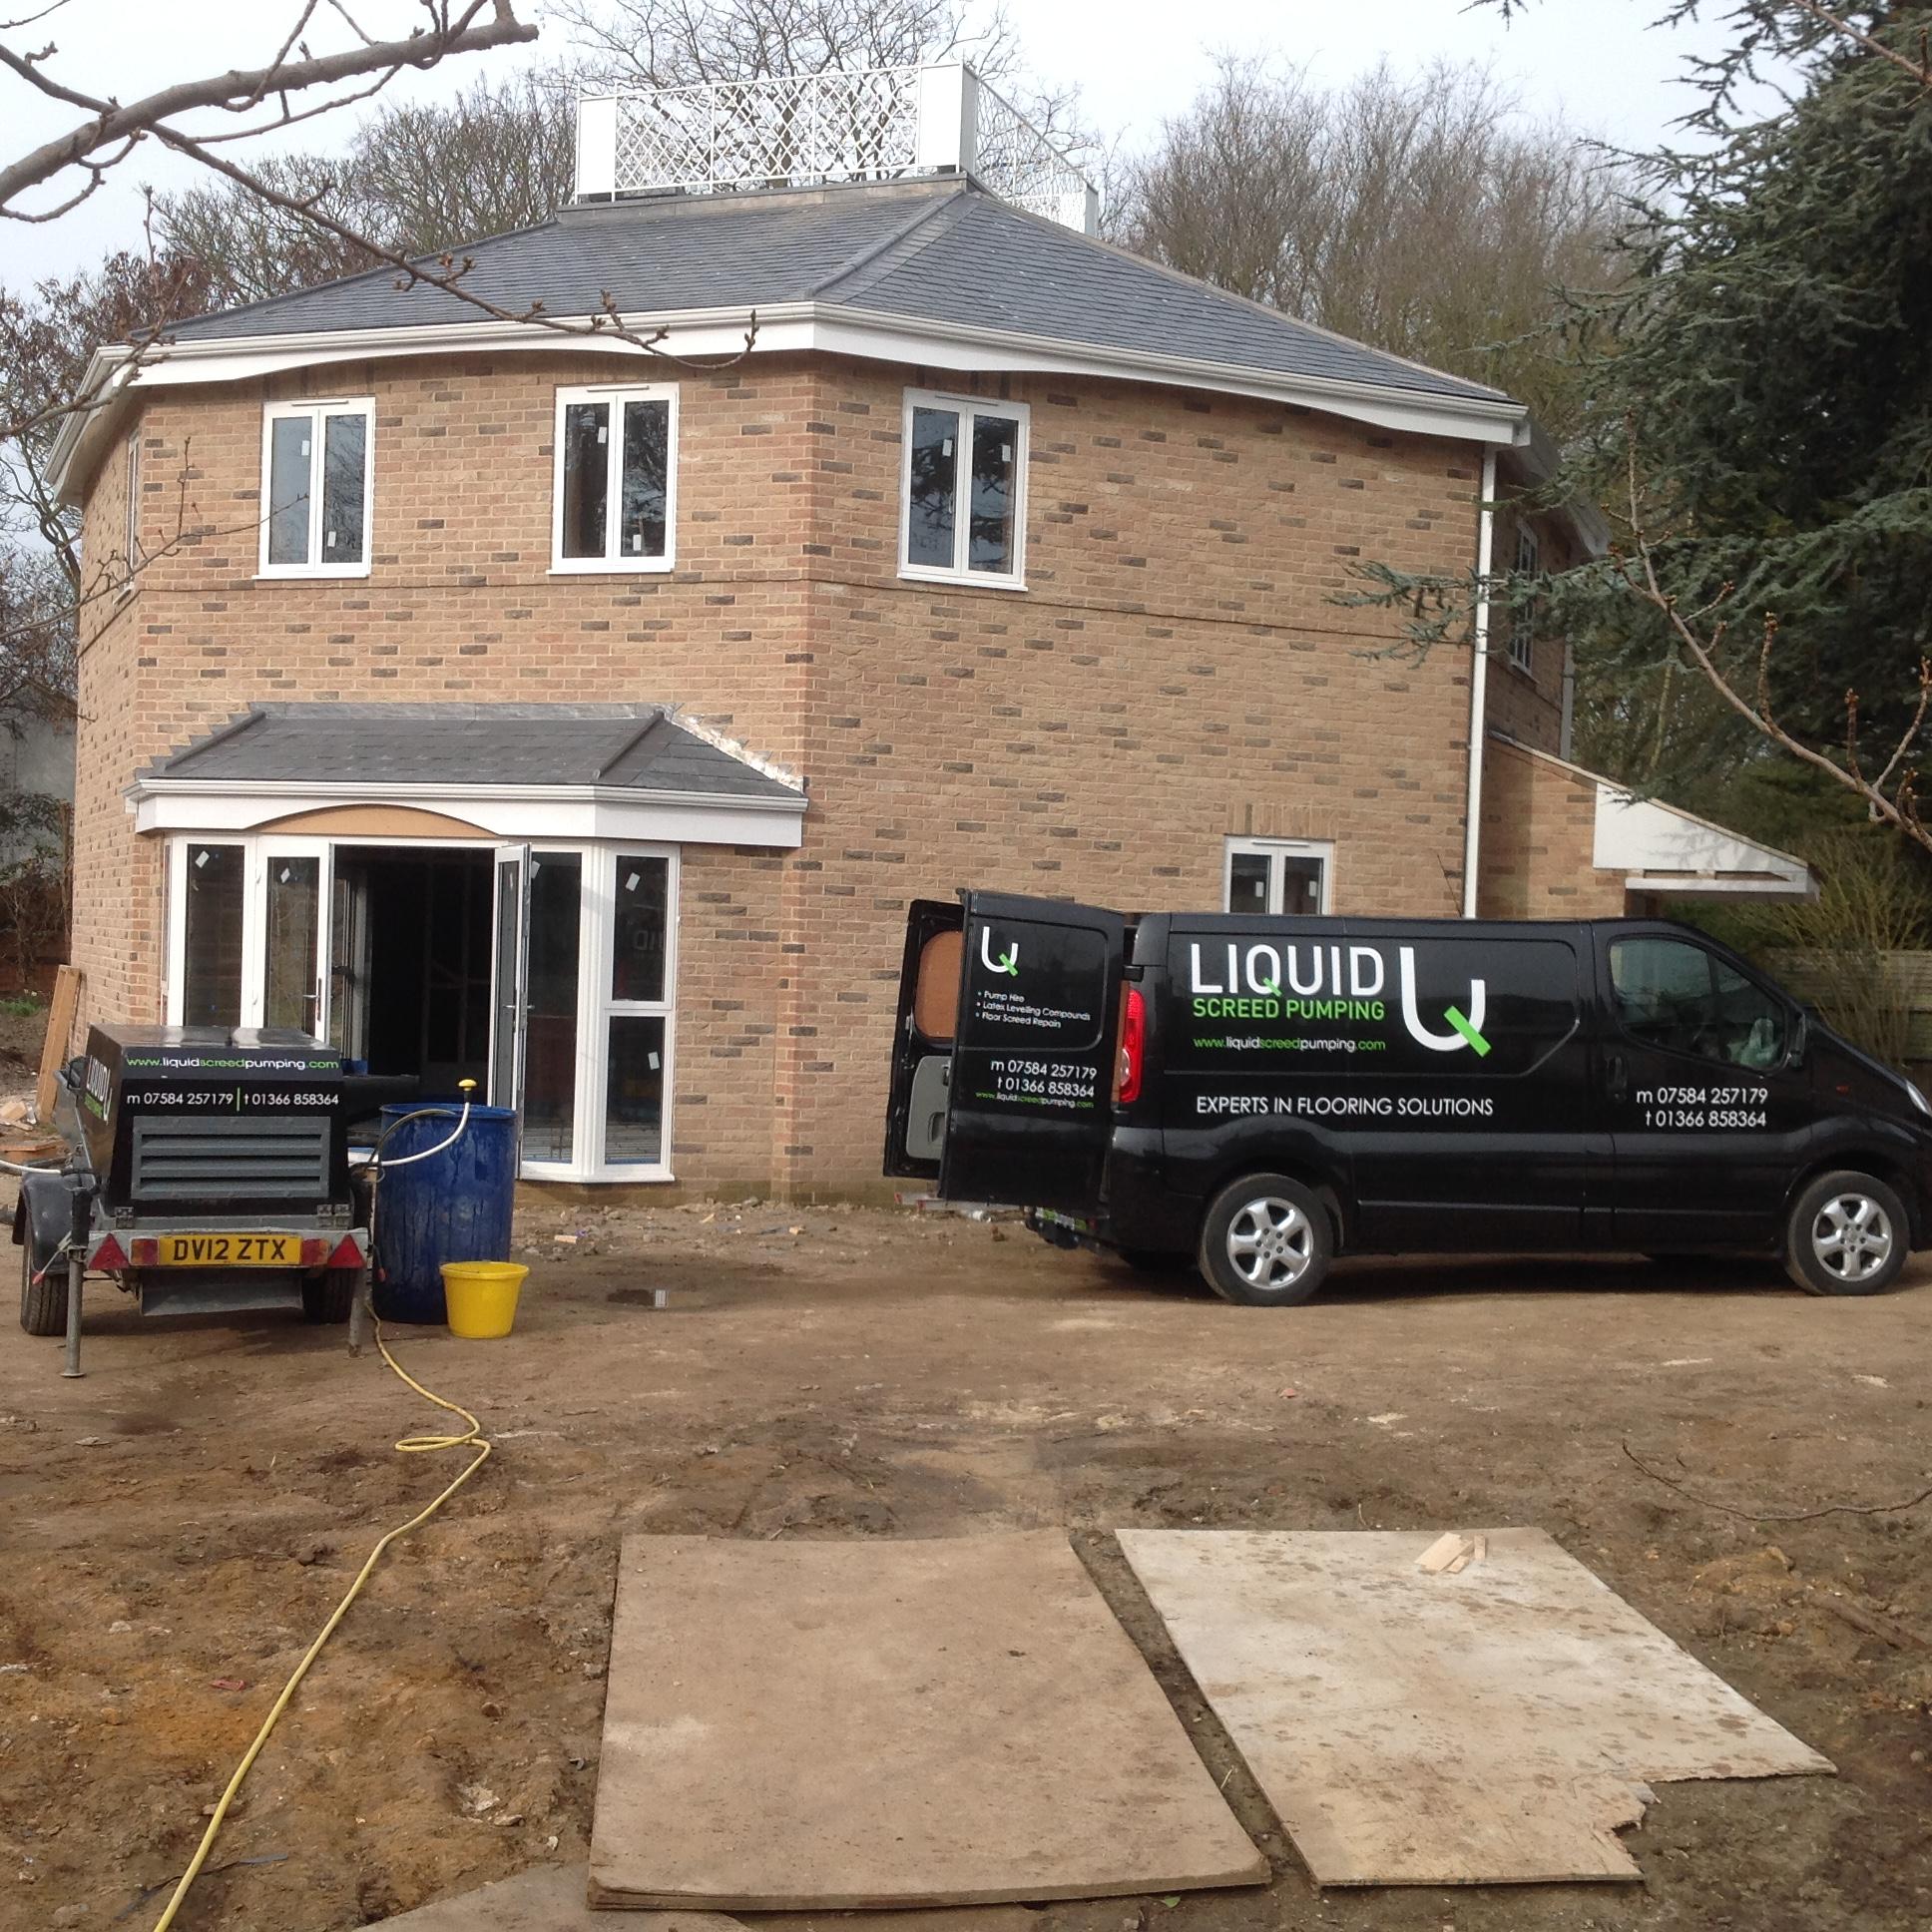 Liquid Screed Pumping - Hilgay, Norfolk PE38 0QE - 01366 858364 | ShowMeLocal.com